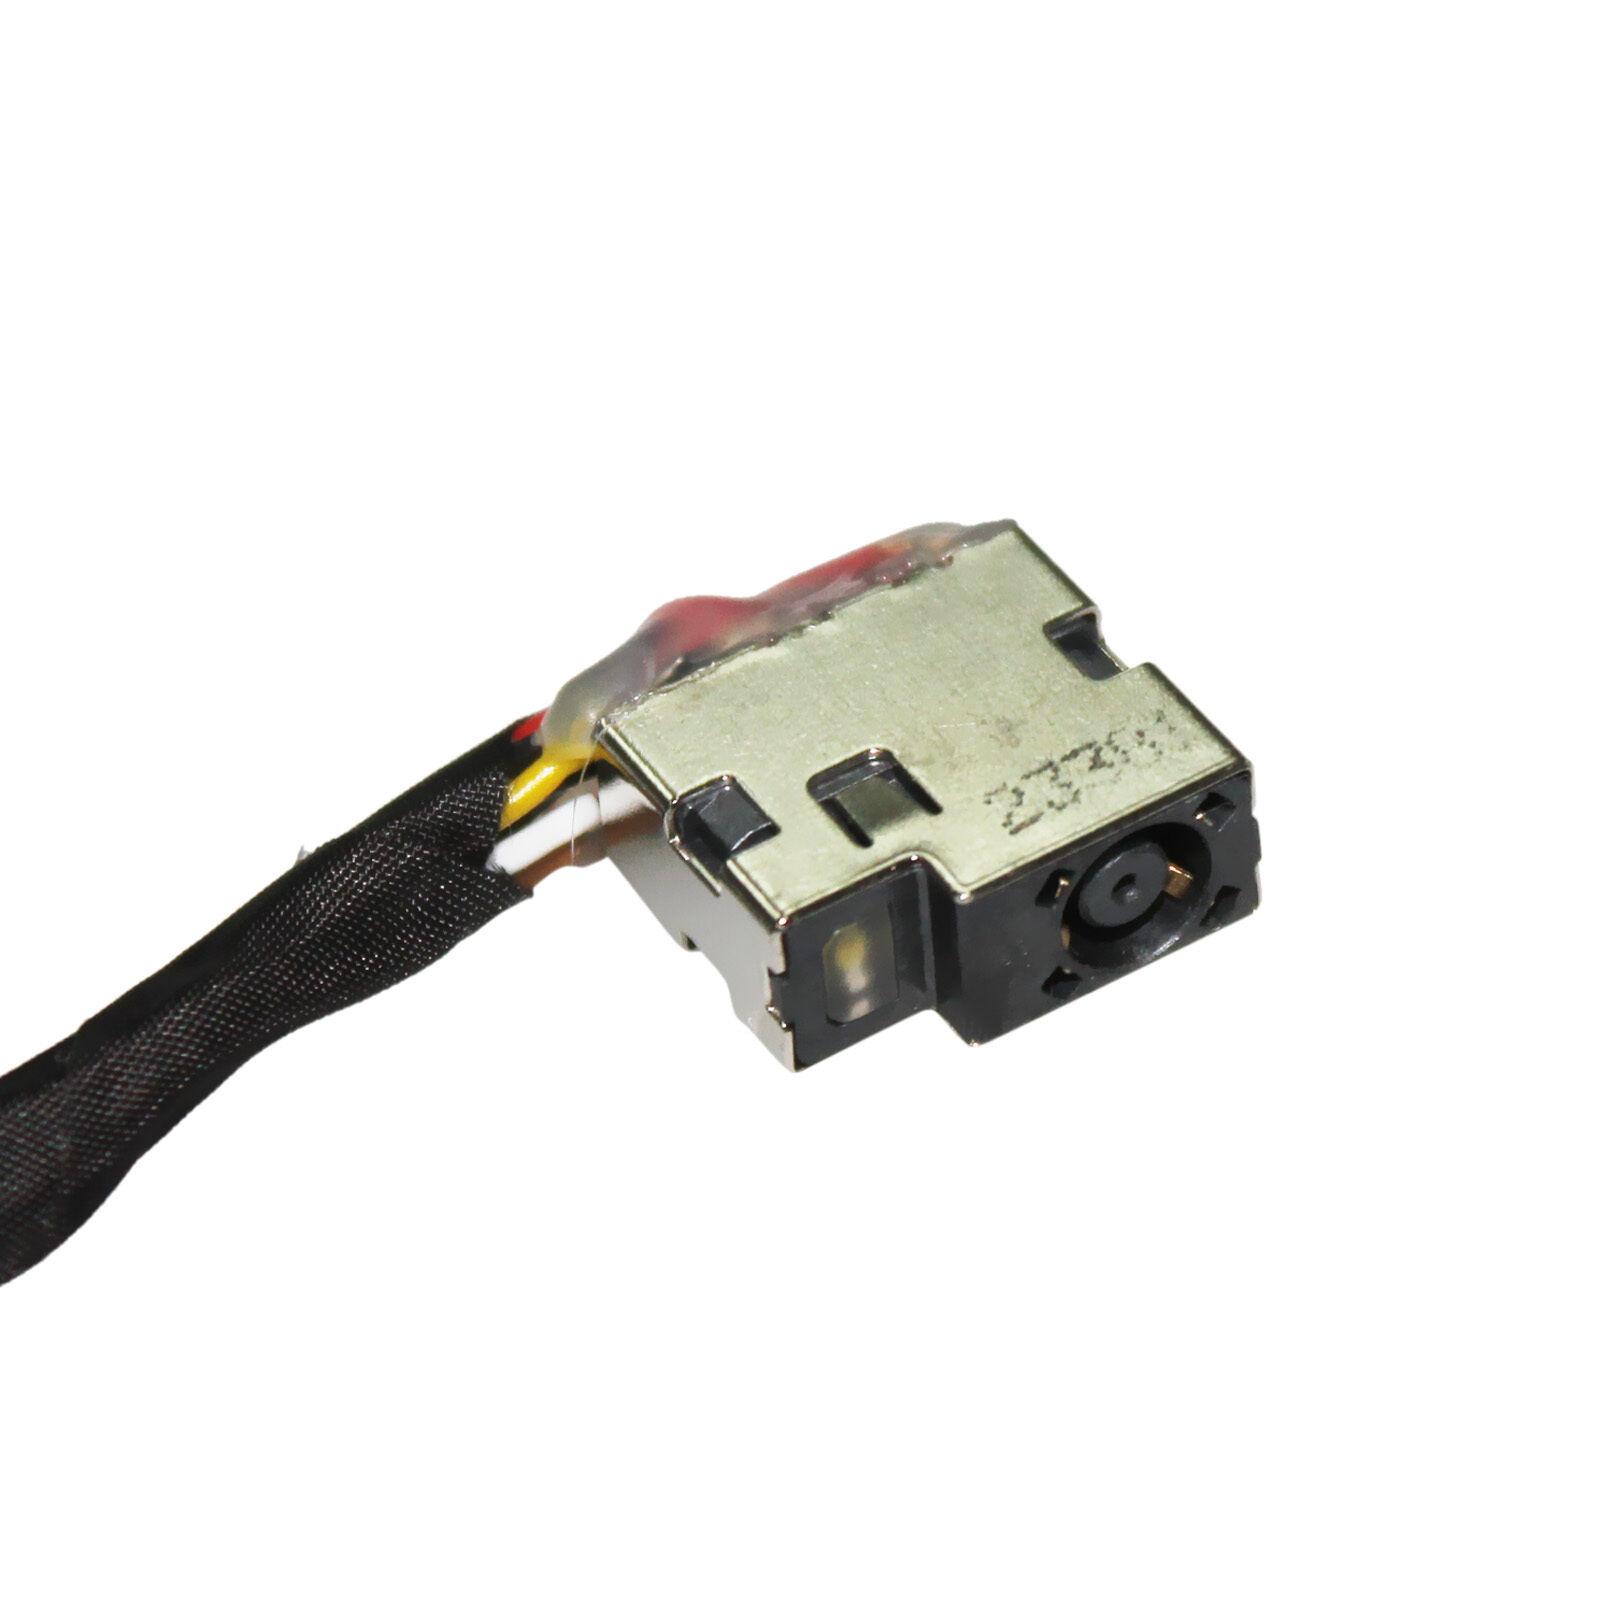 DC JACK POWER CABLE HP PAVILION 14-cb120nr 14-cb112dx 14-cb110ca 14-cb101ca CDUS